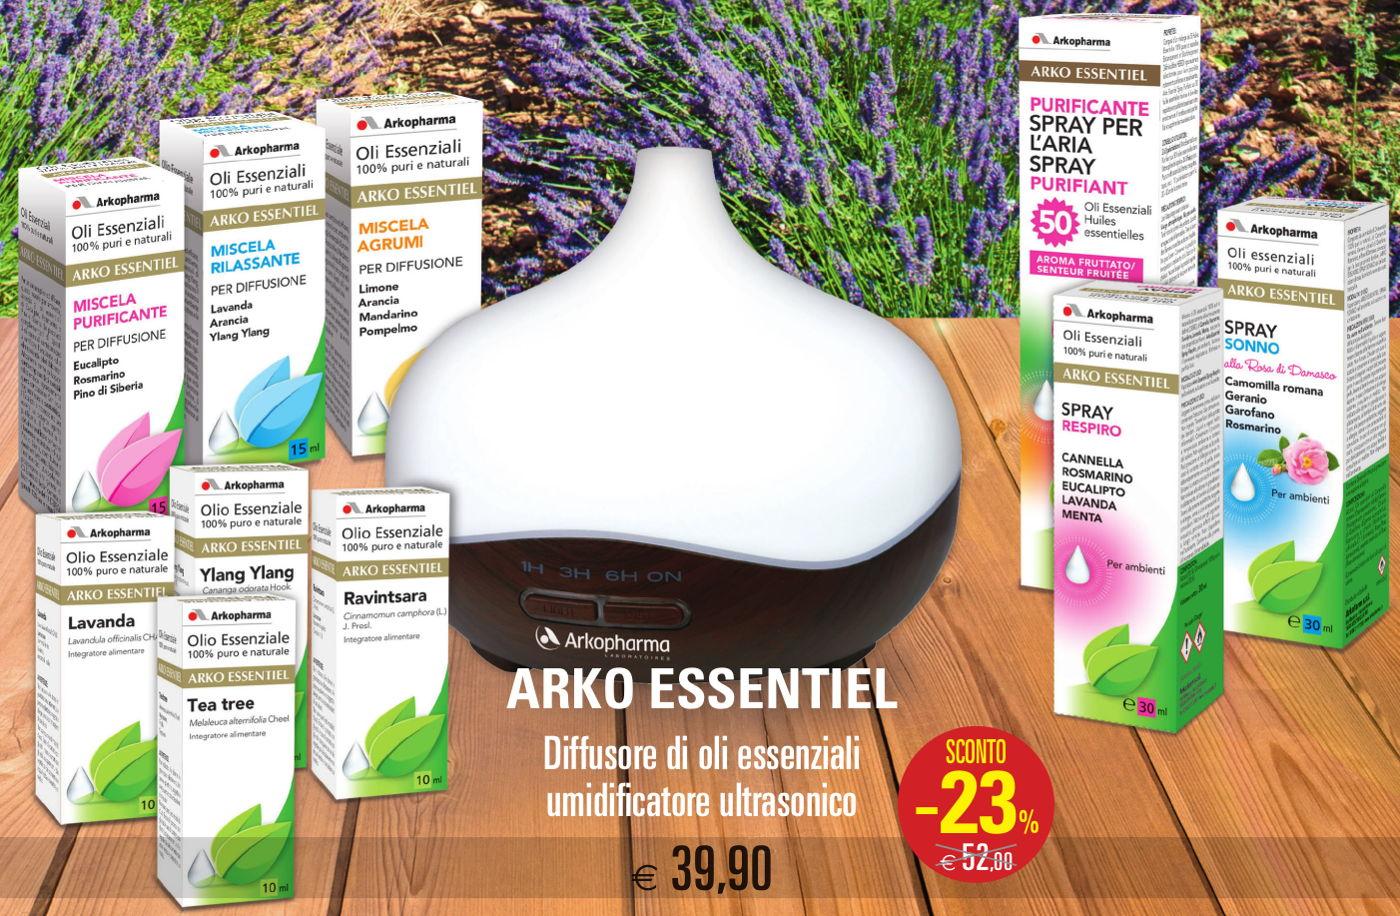 Arko-essentiel - Oli essenziali - Farmacie Comunali Torino